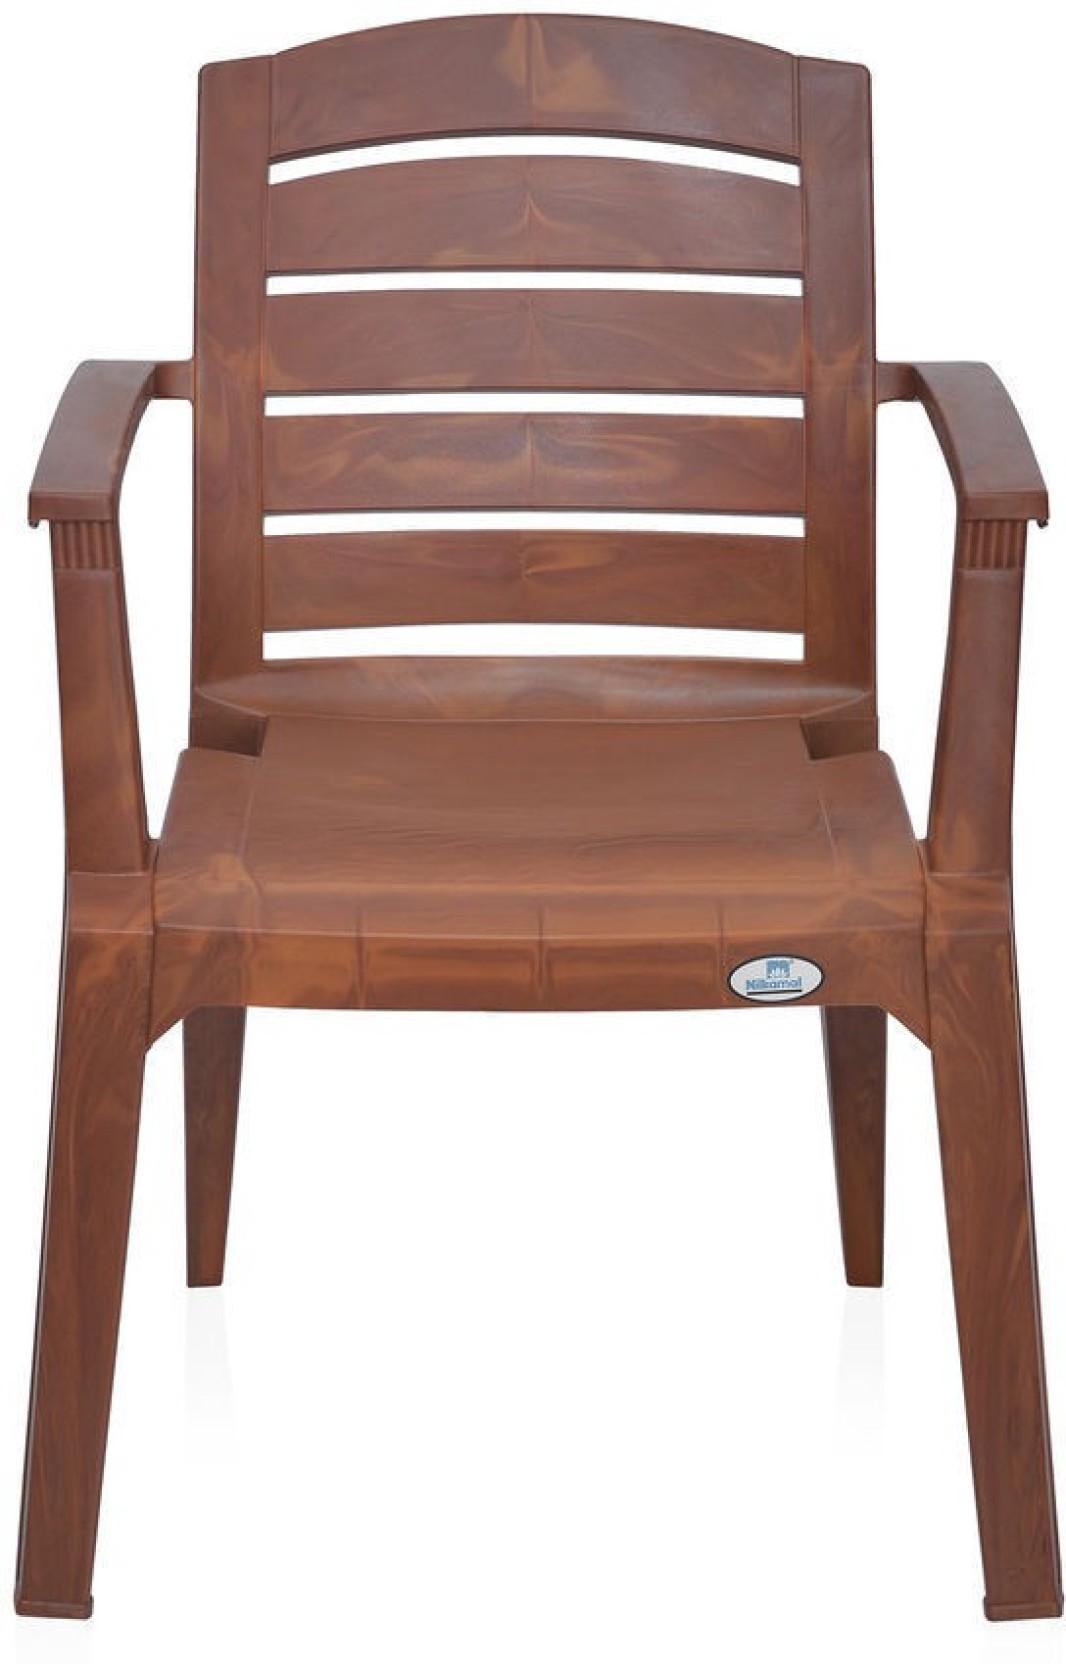 Nilkamal Plastic Outdoor Chair Price in India - Buy Nilkamal Plastic ...